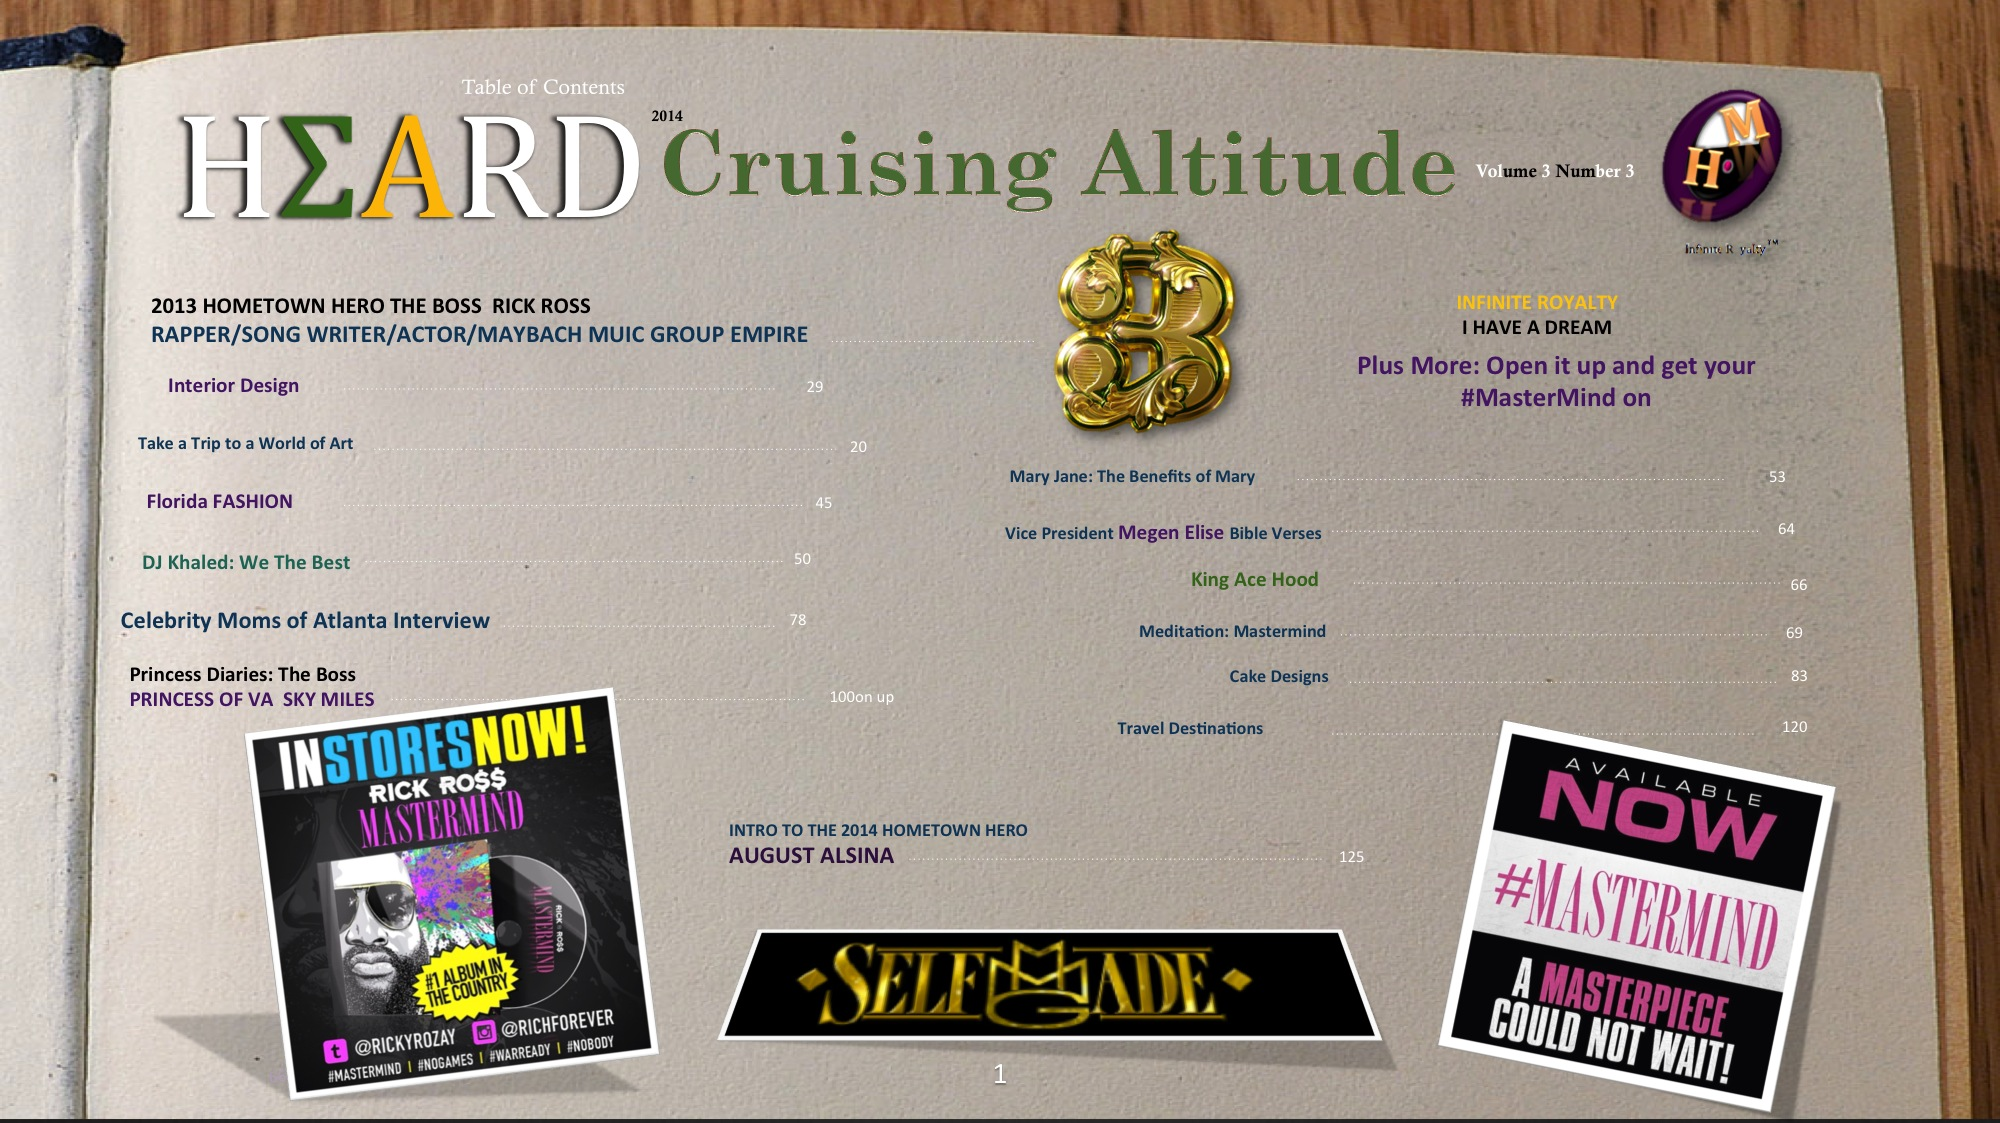 Cruising Altitude #SelfMade Volume 3